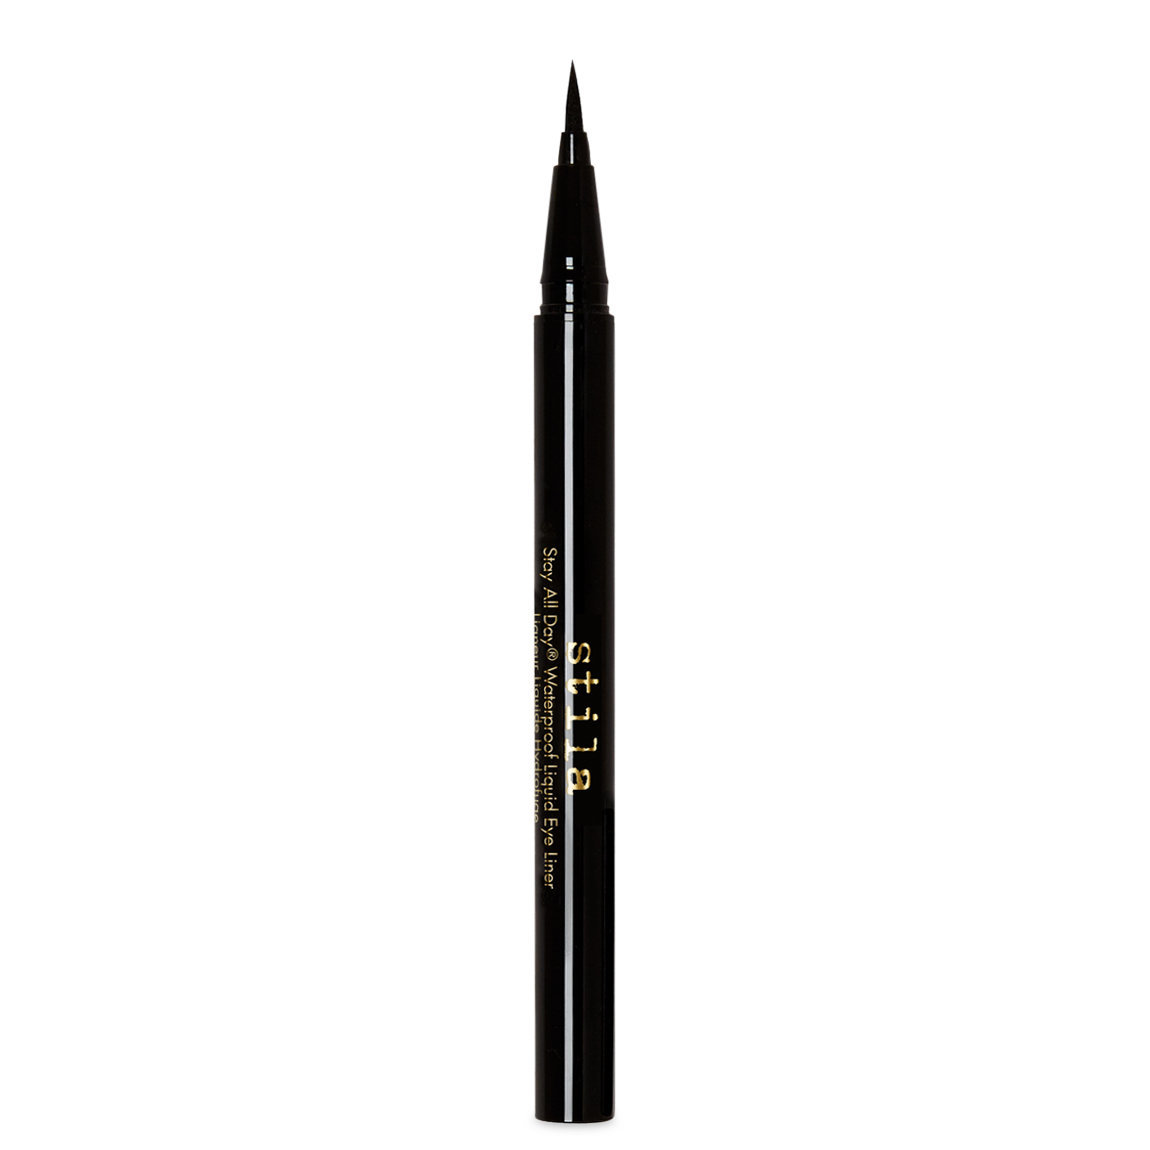 Stila Stay All Day Waterproof Liquid Eye Liner Intense Black alternative view 1.